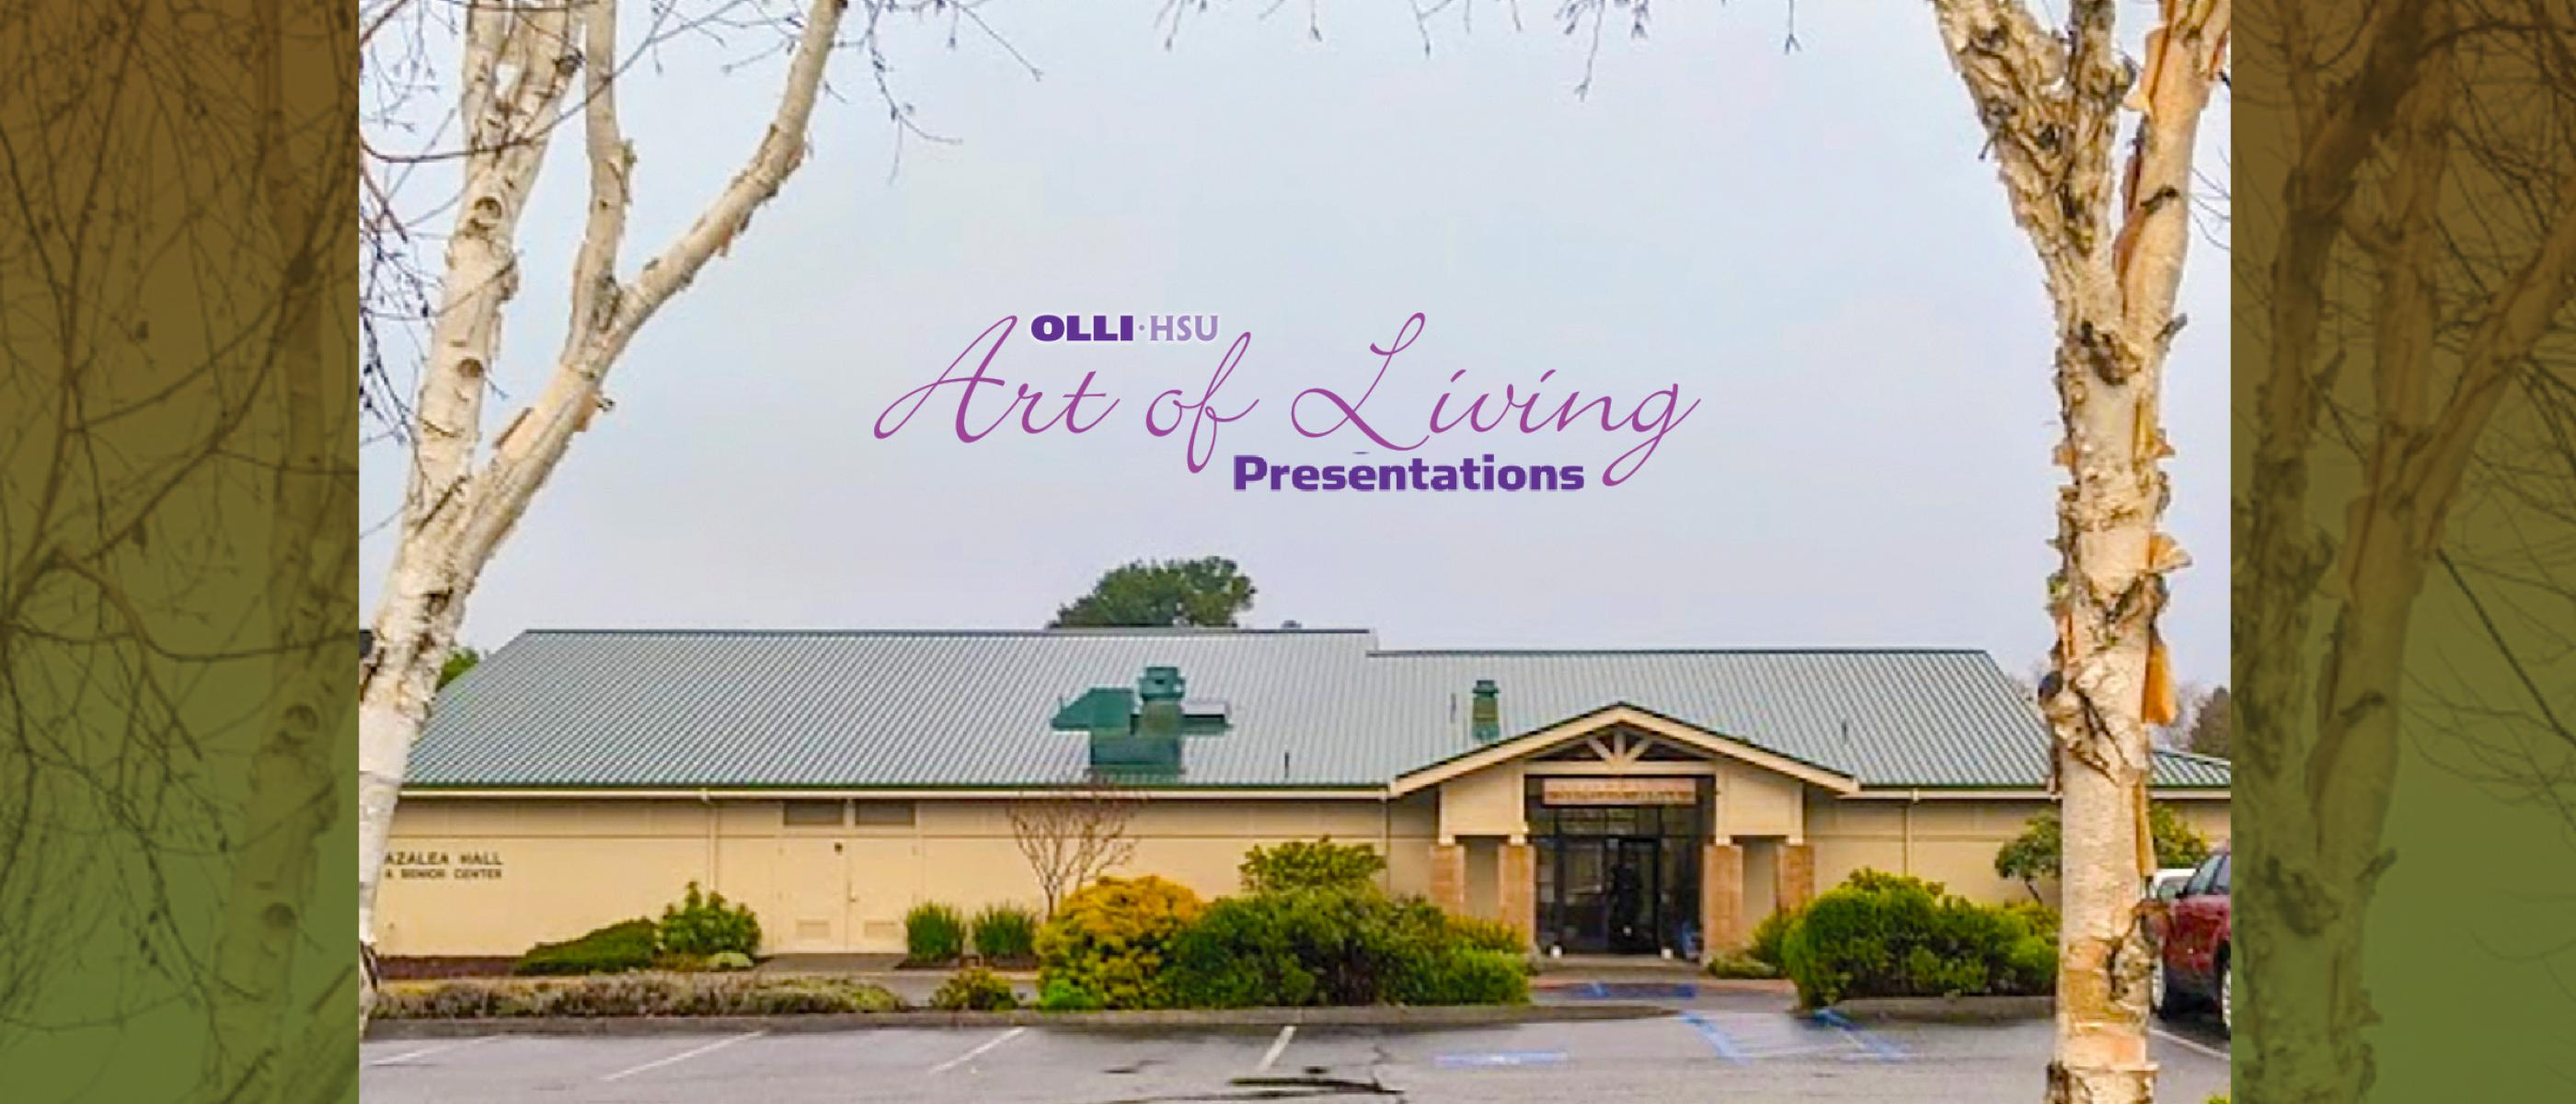 OLLI at HSU Art of Living Presentations